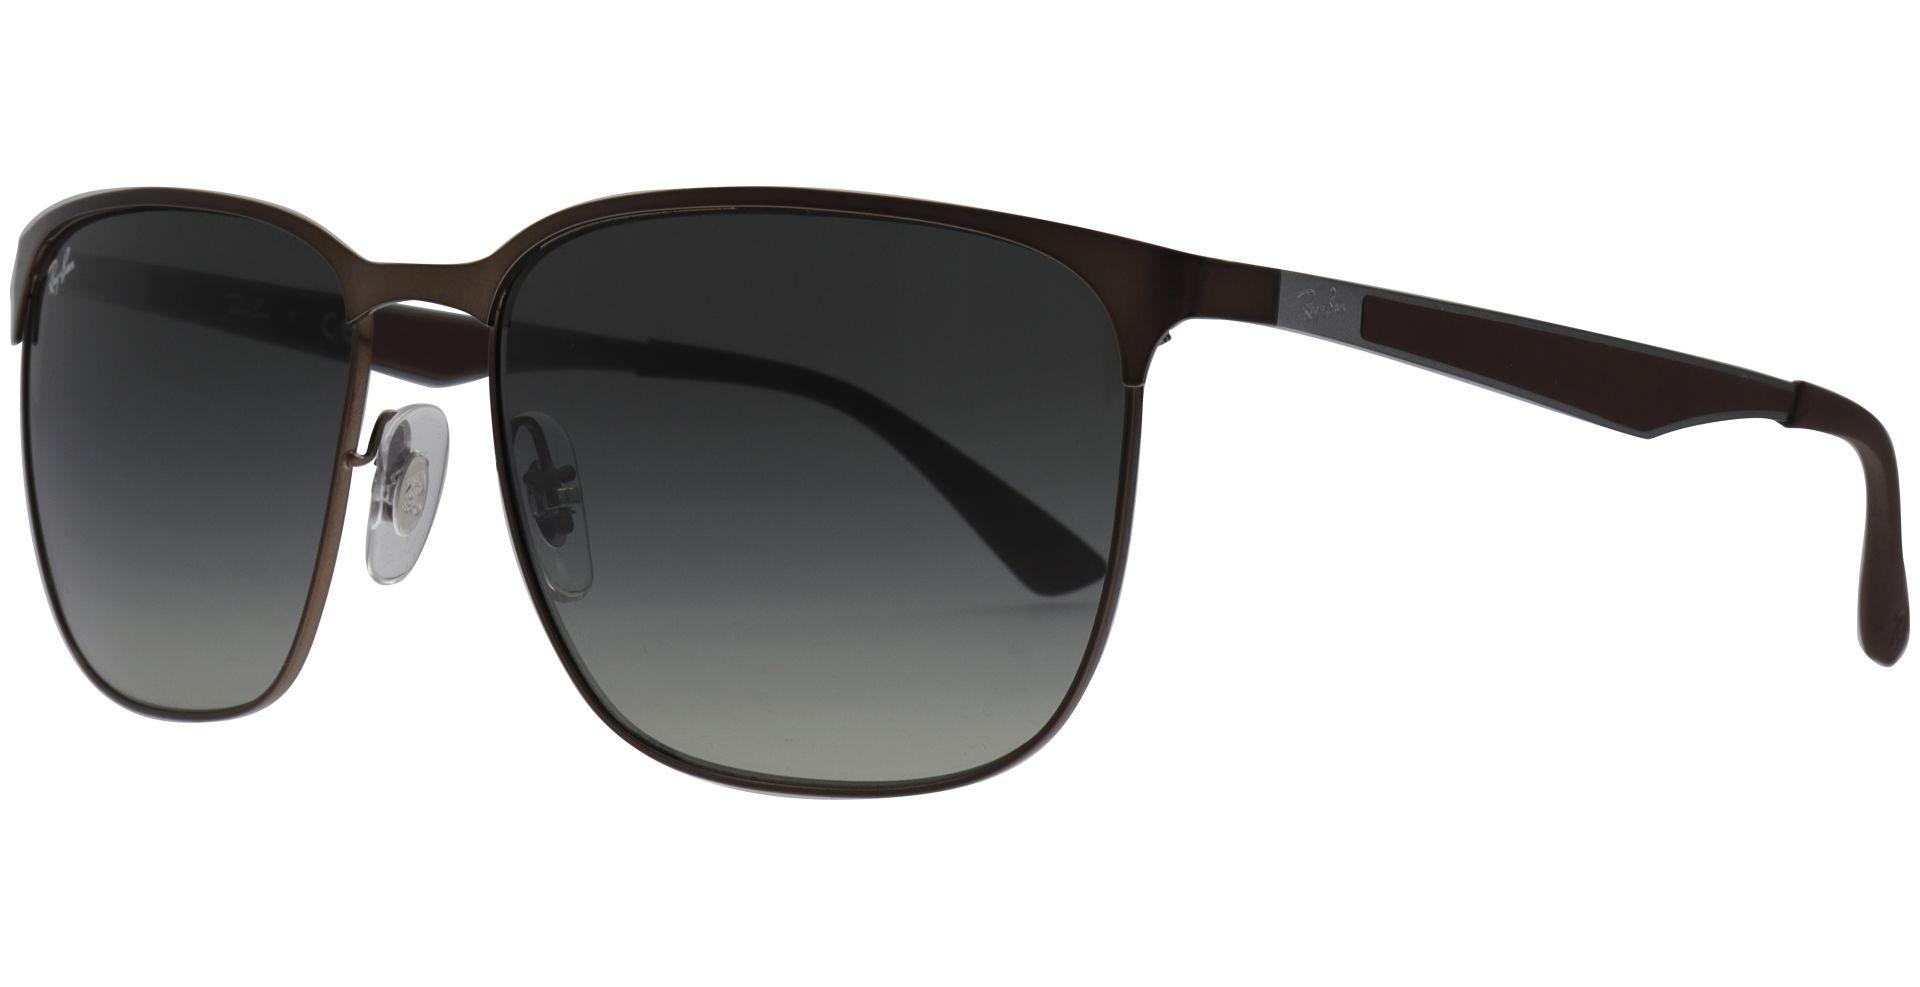 RAY BAN RAY-BAN Sonnenbrille » RB3569«, braun, 121/11 - braun/grau